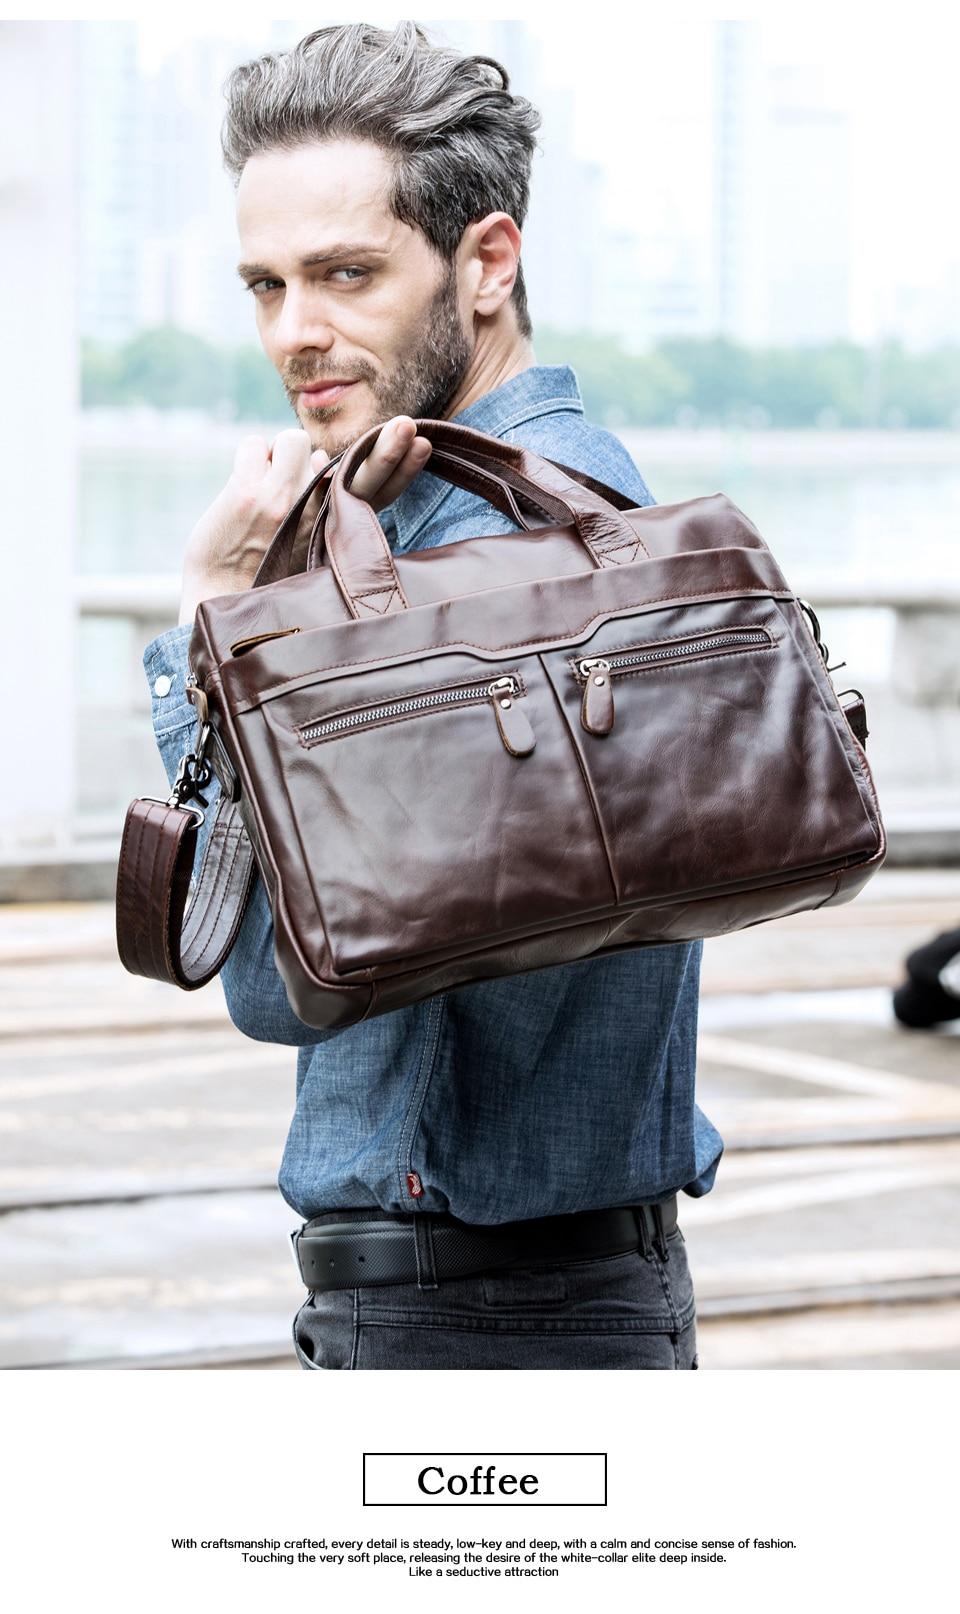 HTB1ZqszbffsK1RjSszgq6yXzpXaK WESTAL genuine leather bag for men's briefcase bussiness laptop bags for documents messenger handbags tote briefcase 9005